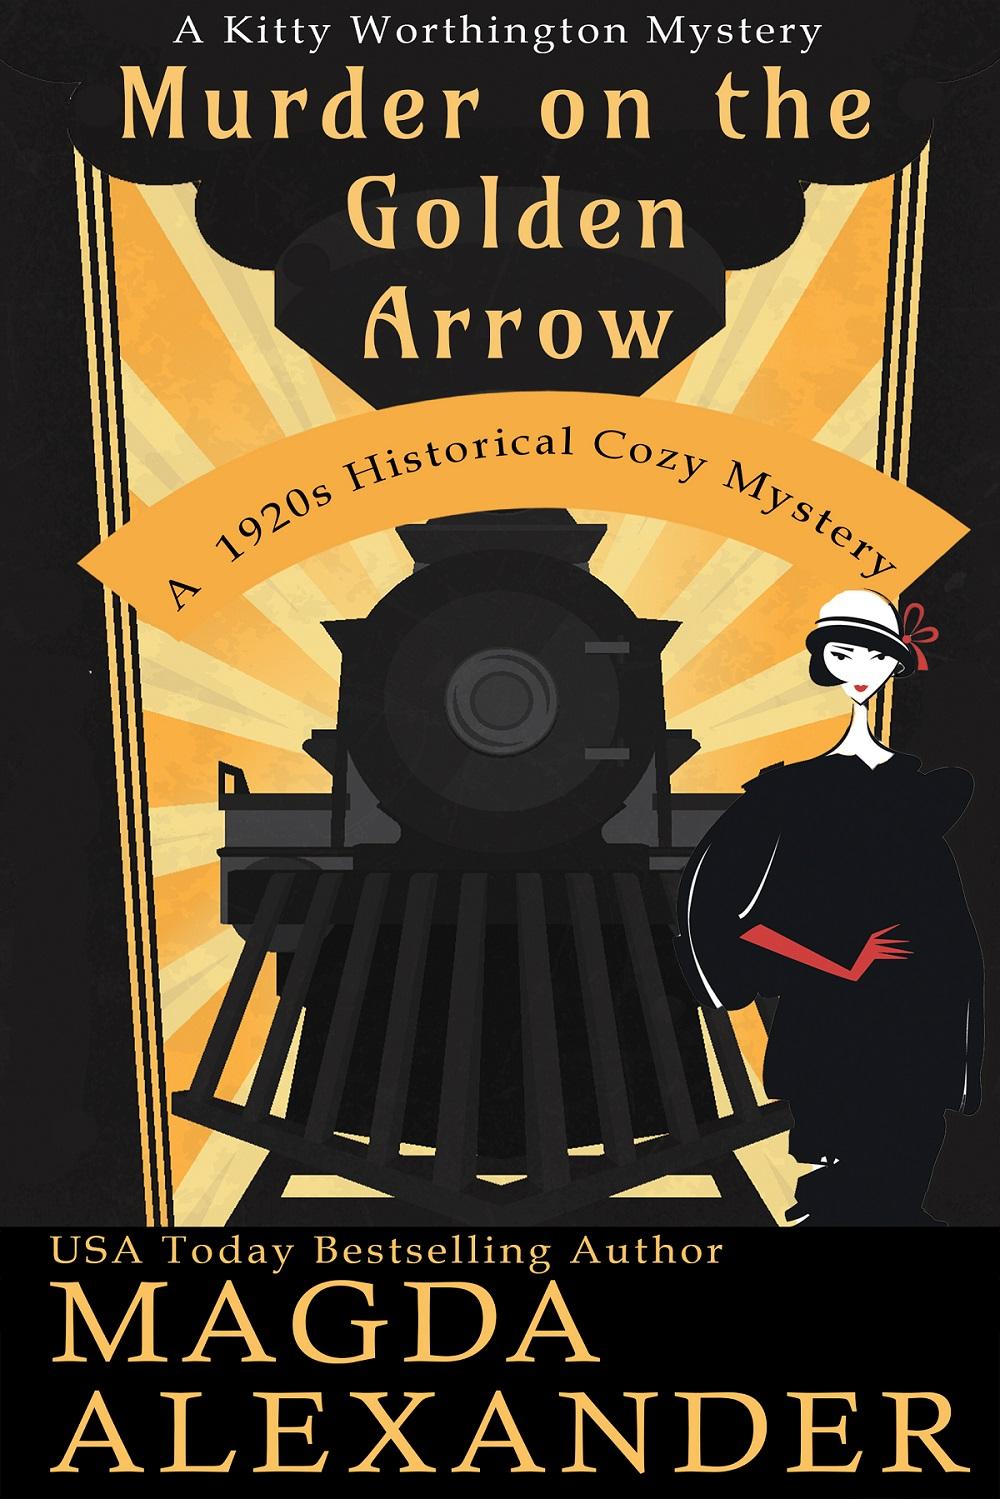 Murder on the Golden Arrow cover